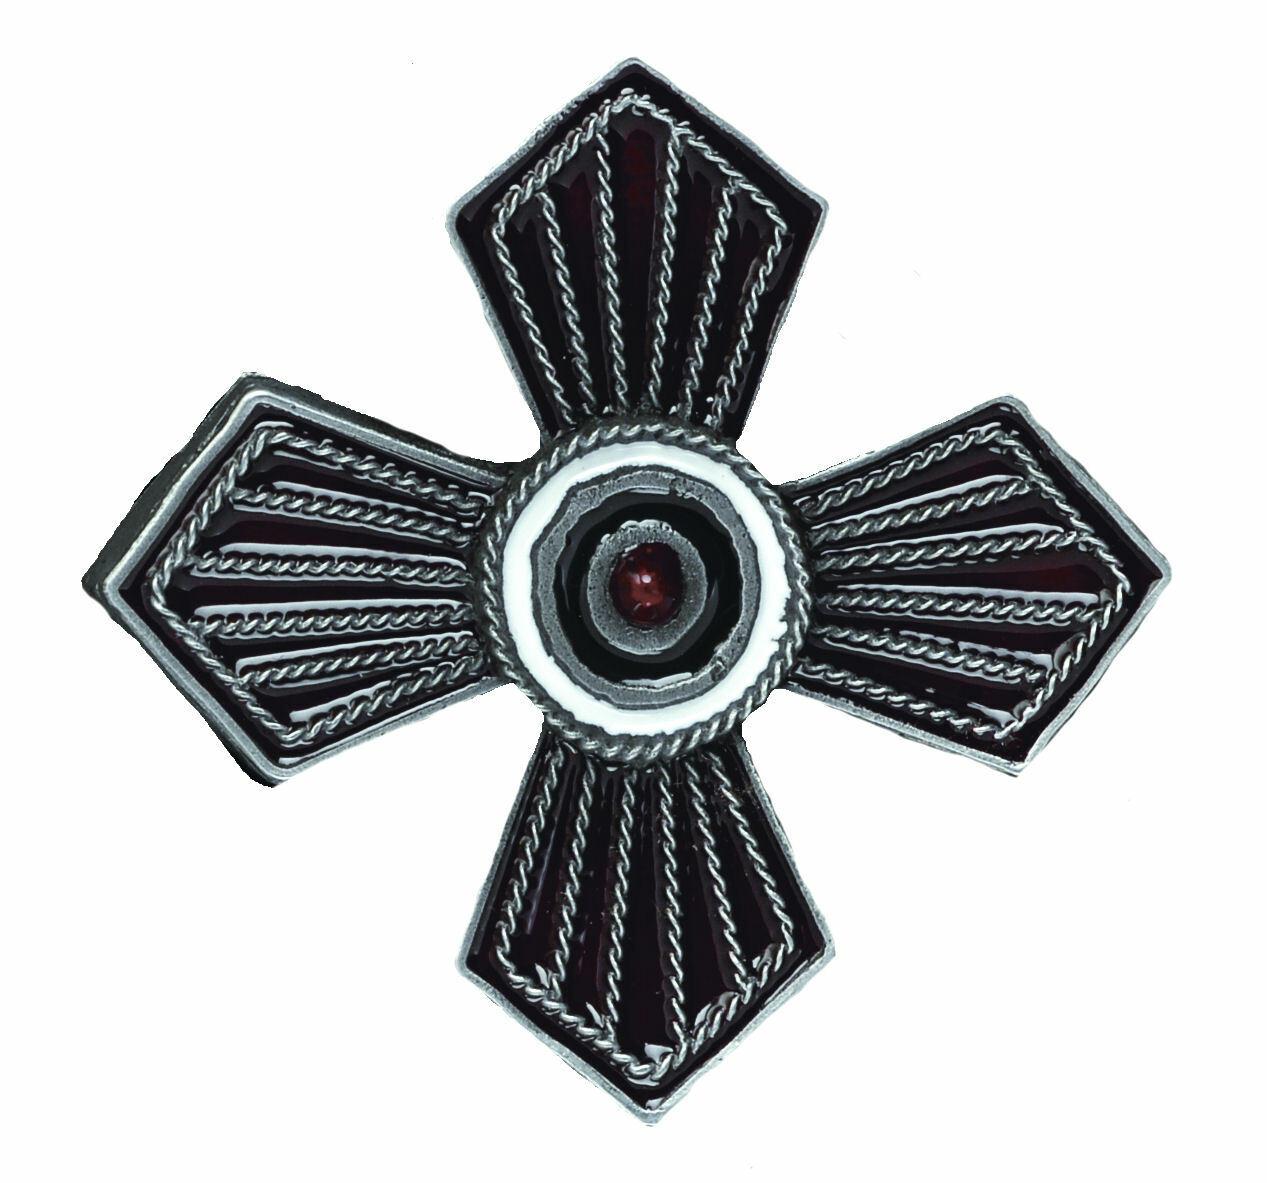 Pagan Cross Buckle and Belt, Heavy, Mystical, Medieval, Viking, Dragon Designs